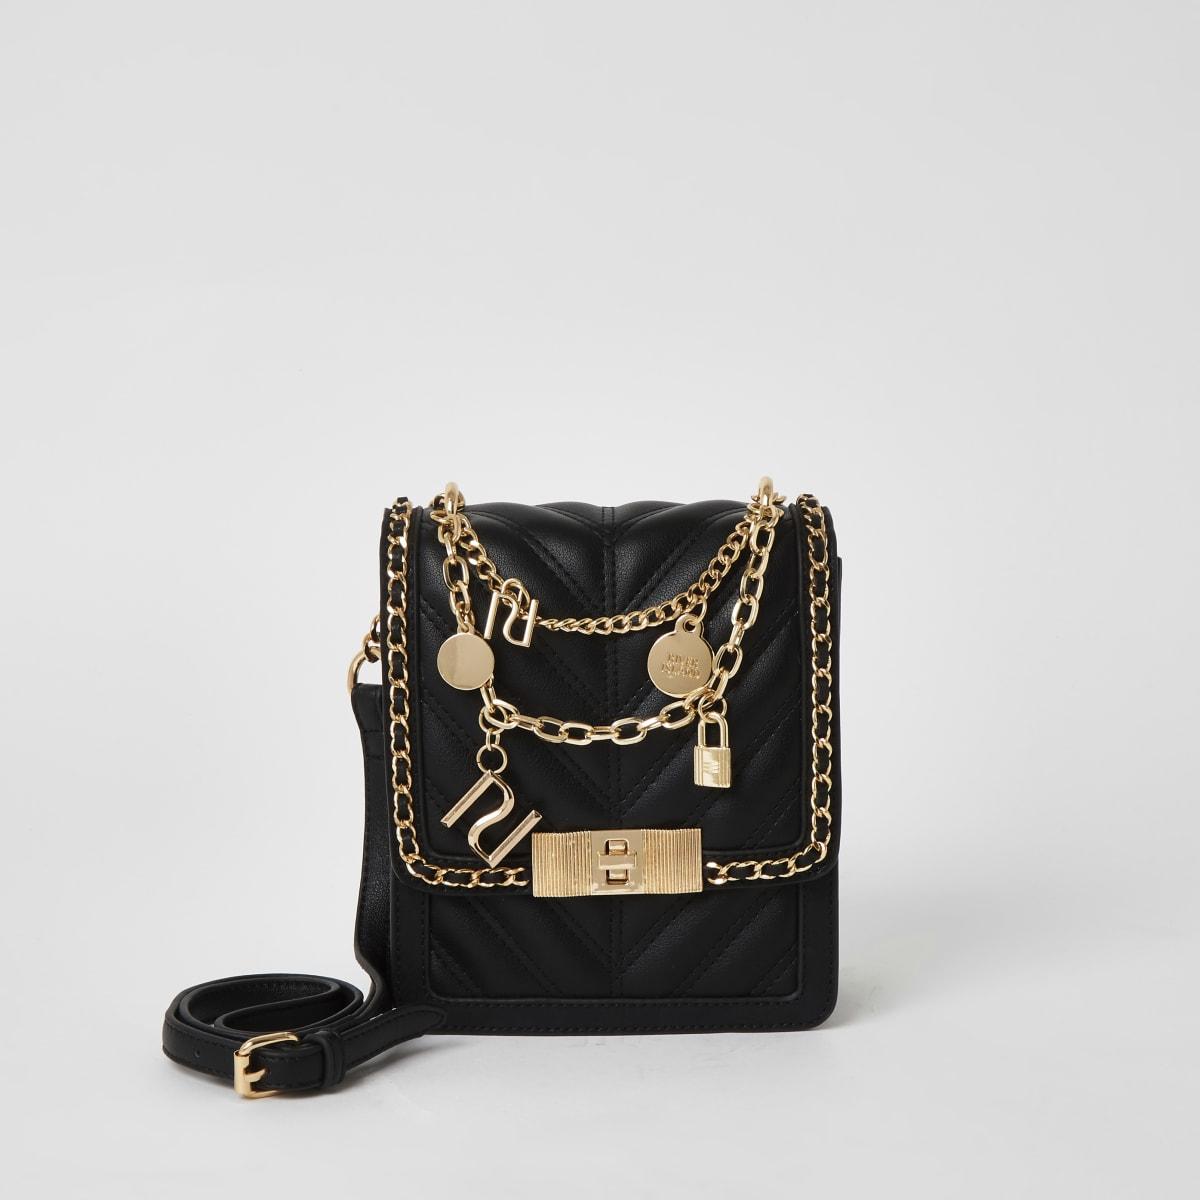 Black chain embossed boxy cross body bag